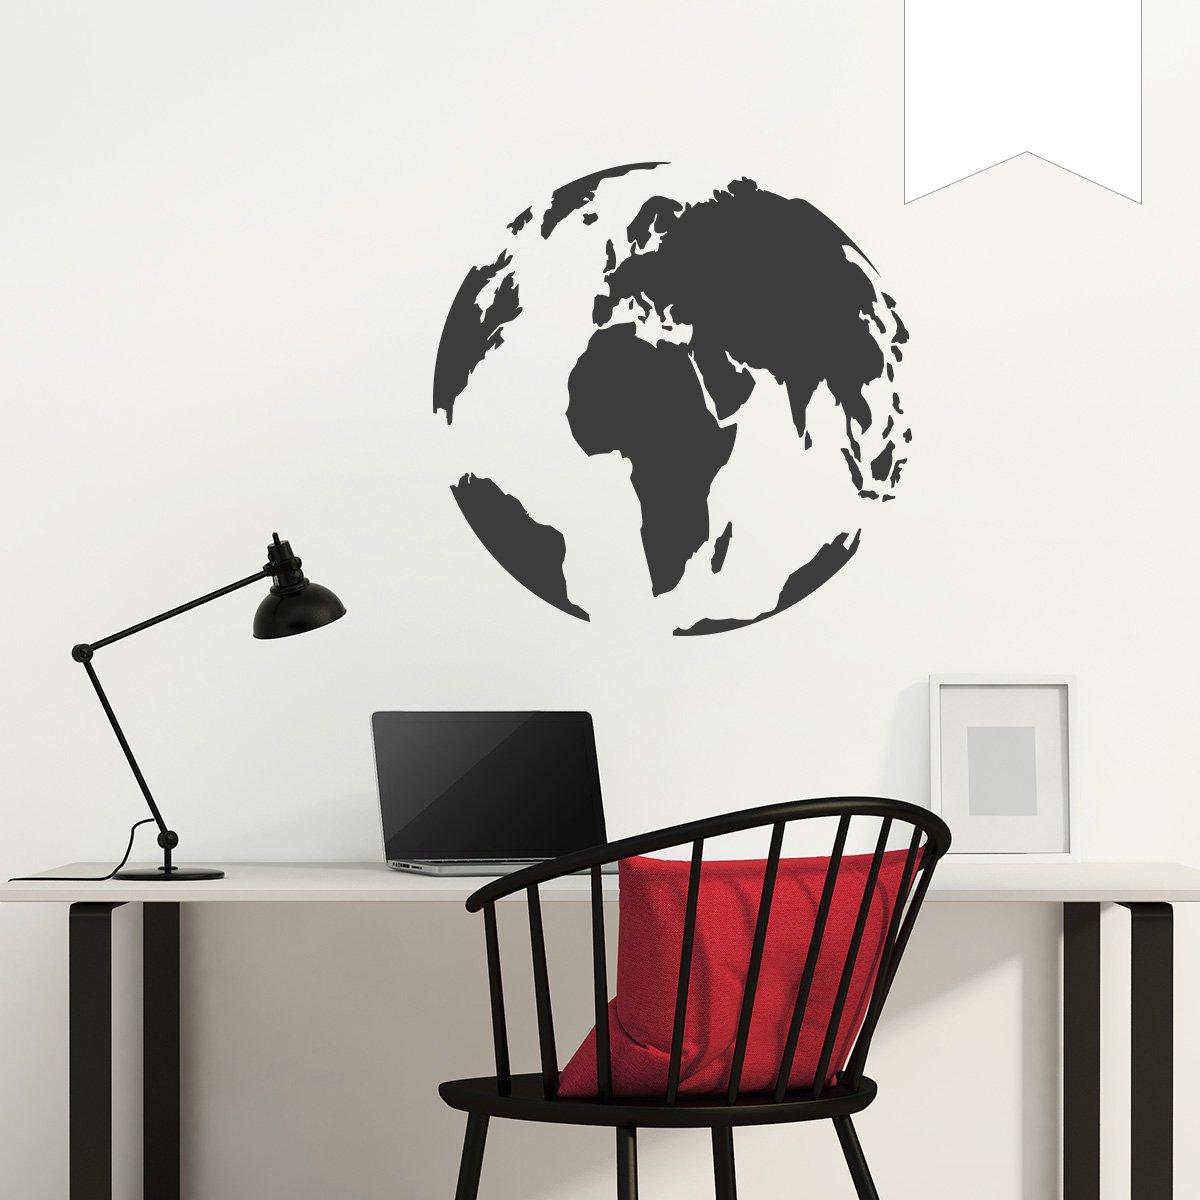 WANDKINGS Wandtattoo - Globus - 90 90 90 x 90 cm - Kupfer - Wähle aus 5 Größen & 35 Farben B078YD6L4R Wandtattoos & Wandbilder 862a4a